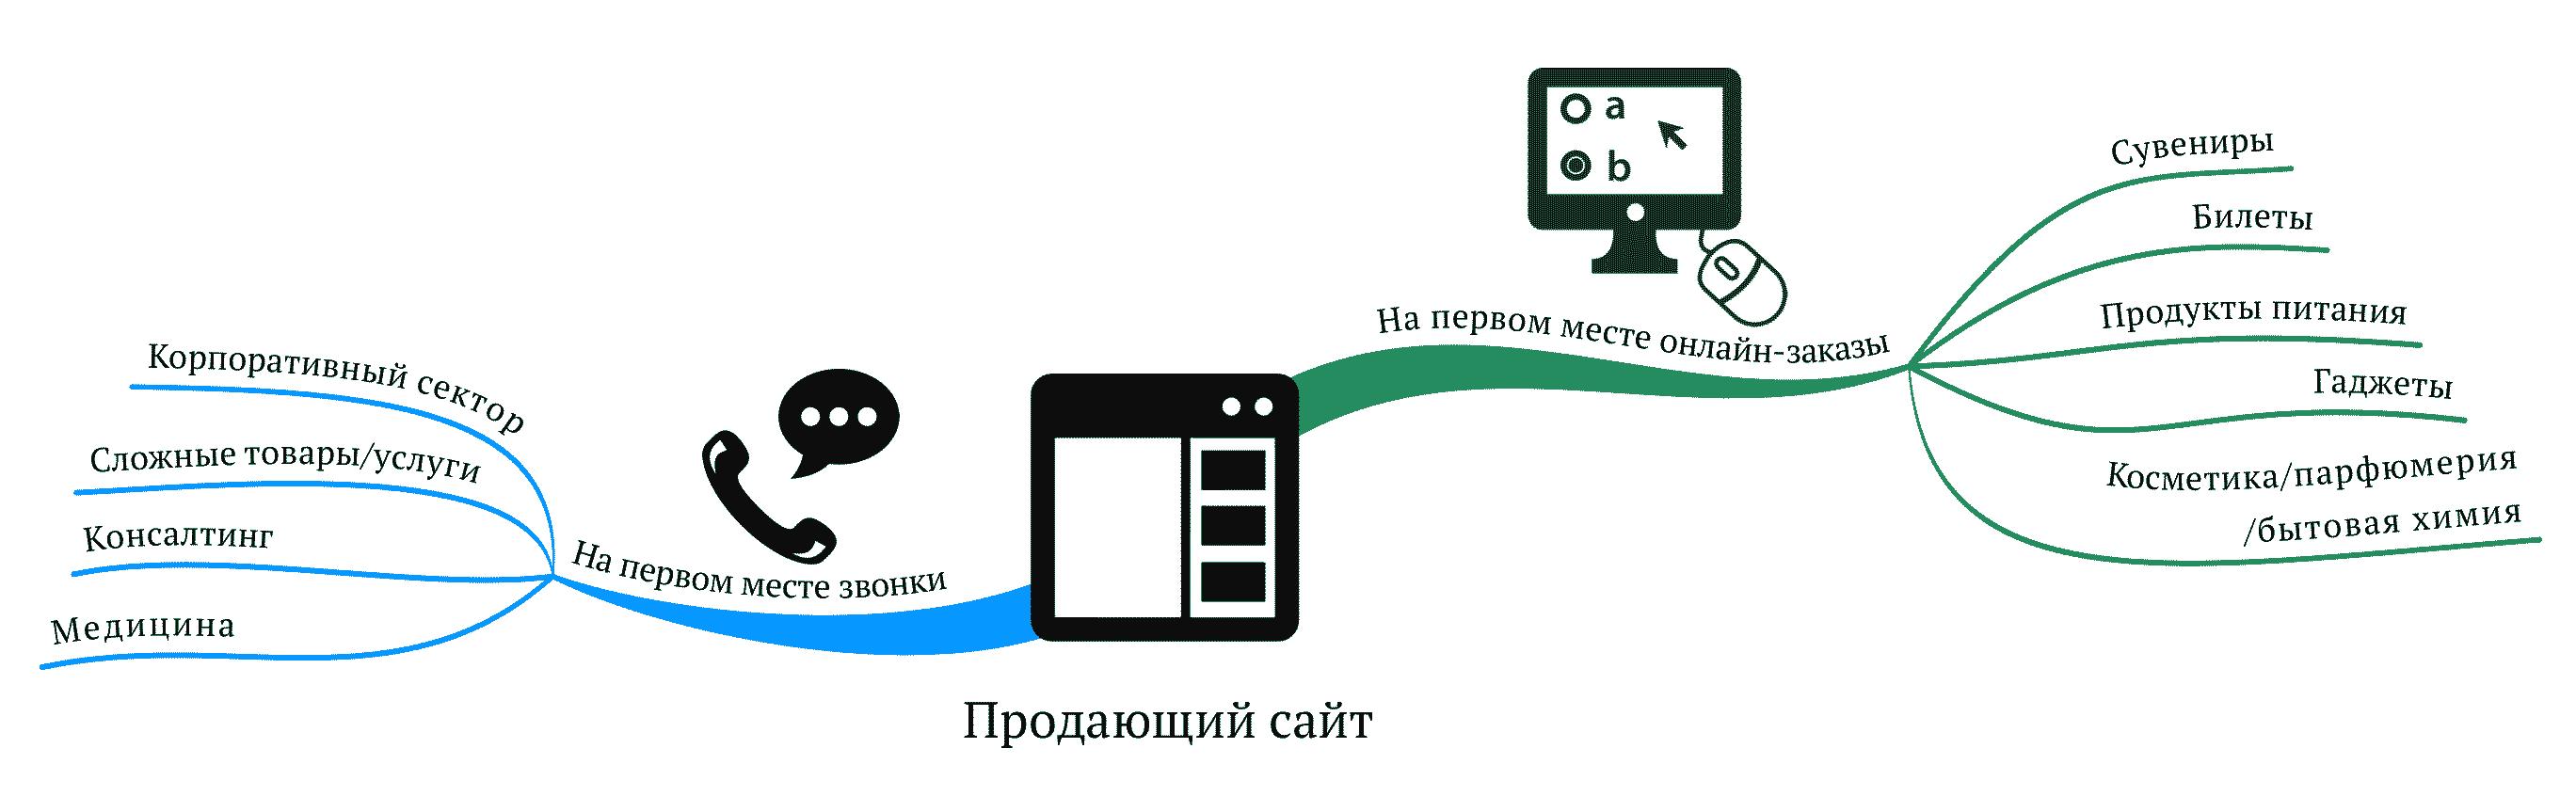 Звонки или онлайн-заказы